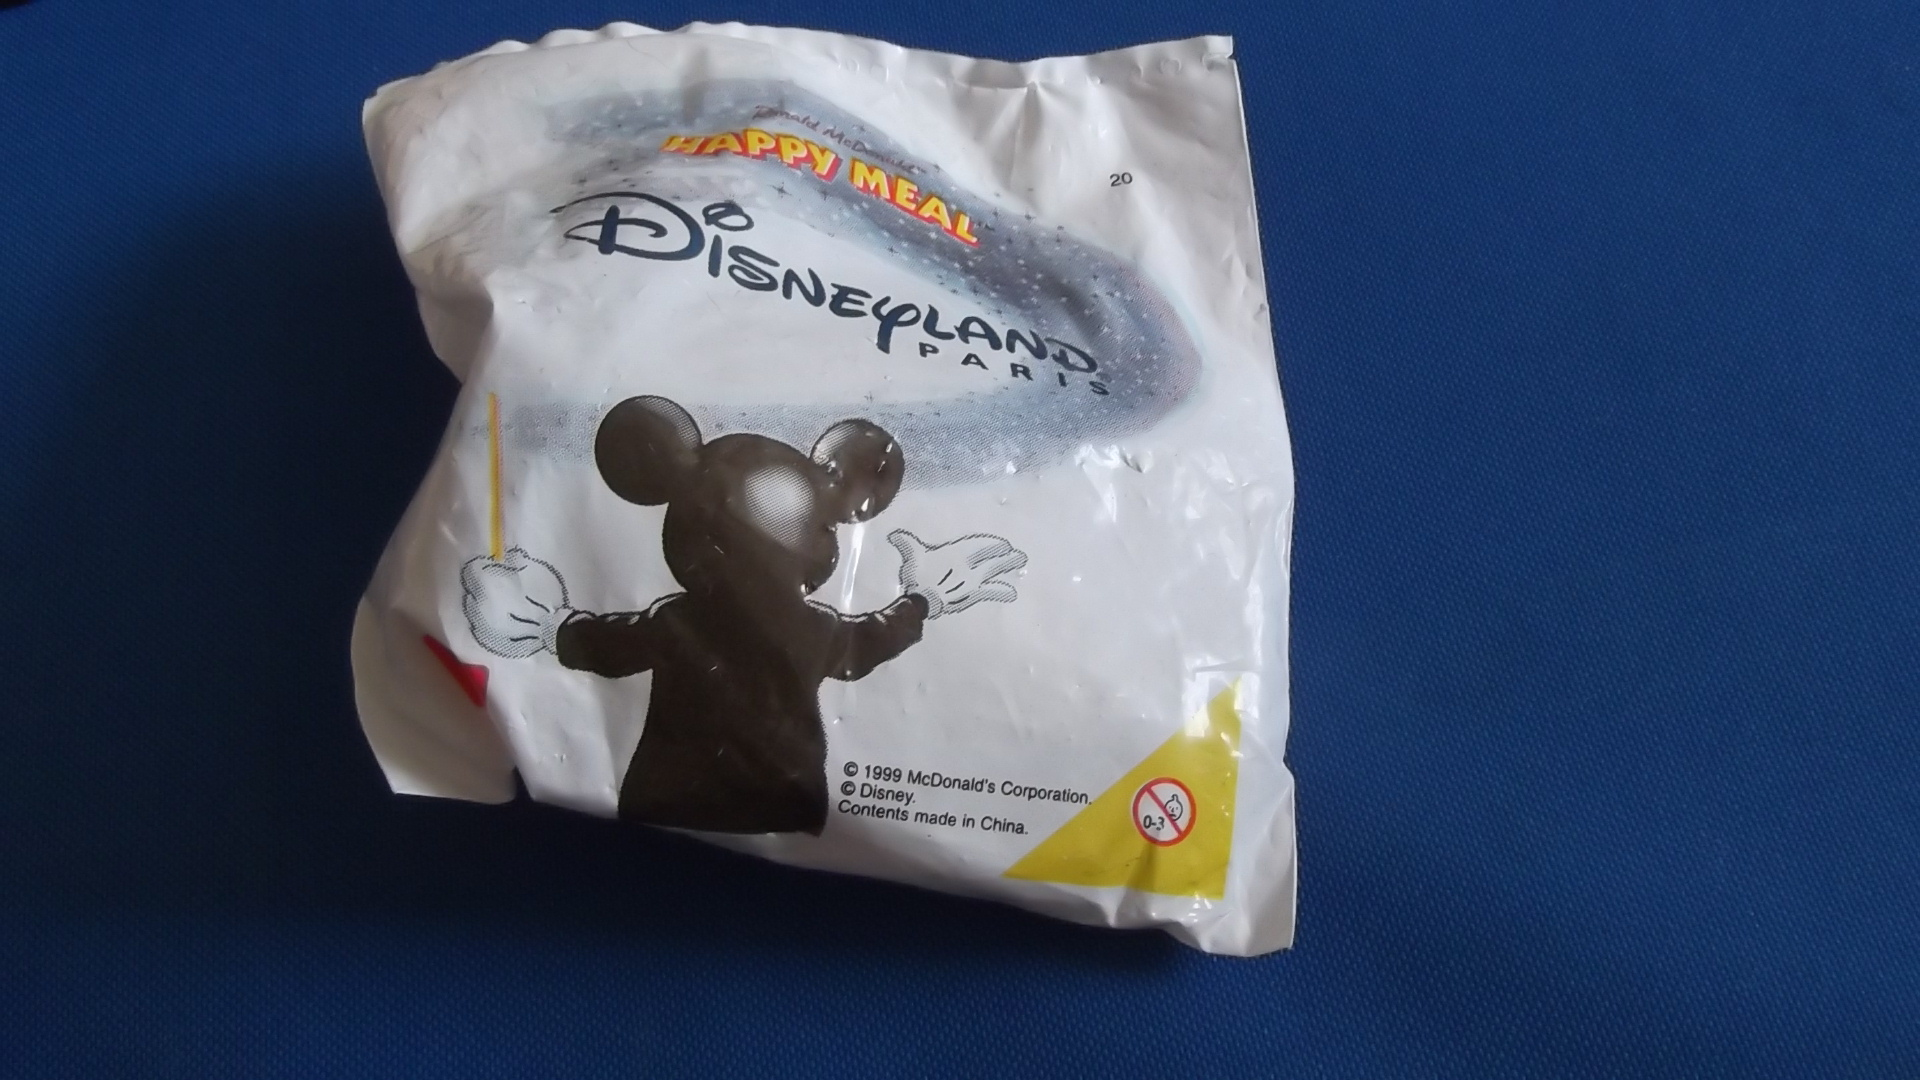 McDonalds Disneyland Paris Train #20 Toy From 1999 New